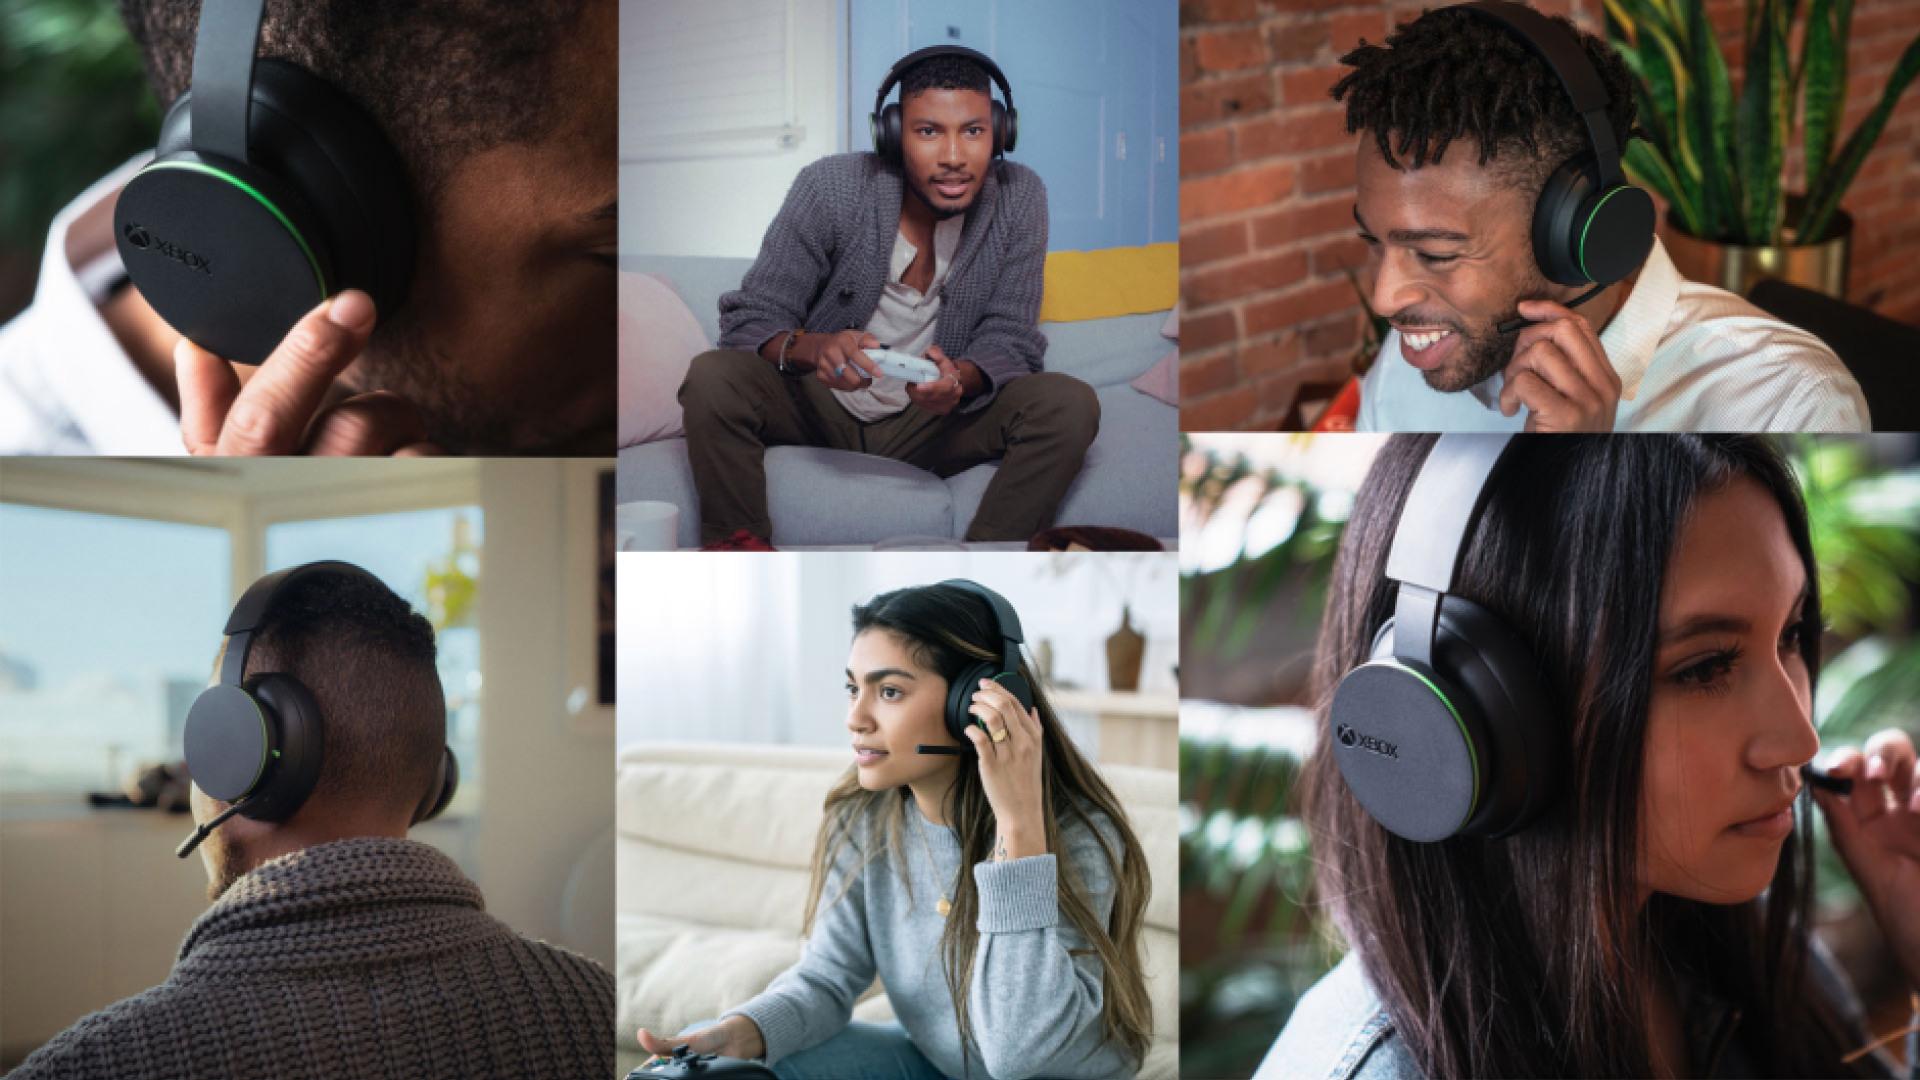 New Xbox Wireless Headset - Game Audio/Mic Issues on PC via Bluetooth XboxWire_WirelessHeadset_LifestyleAsset.jpg